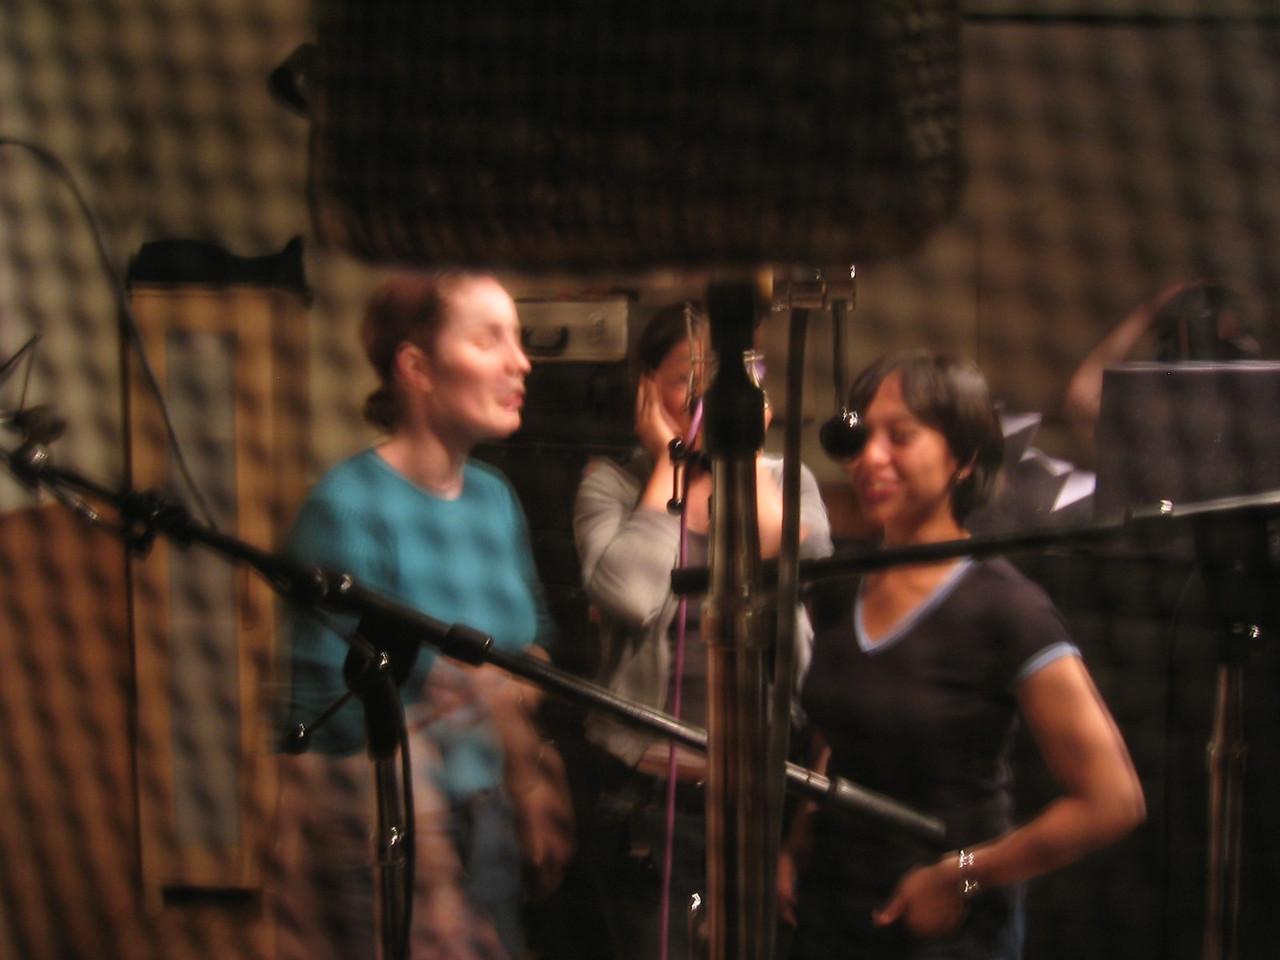 Rat's view of altos Sylvia, Rebecca, & AnnMarie through an air vent